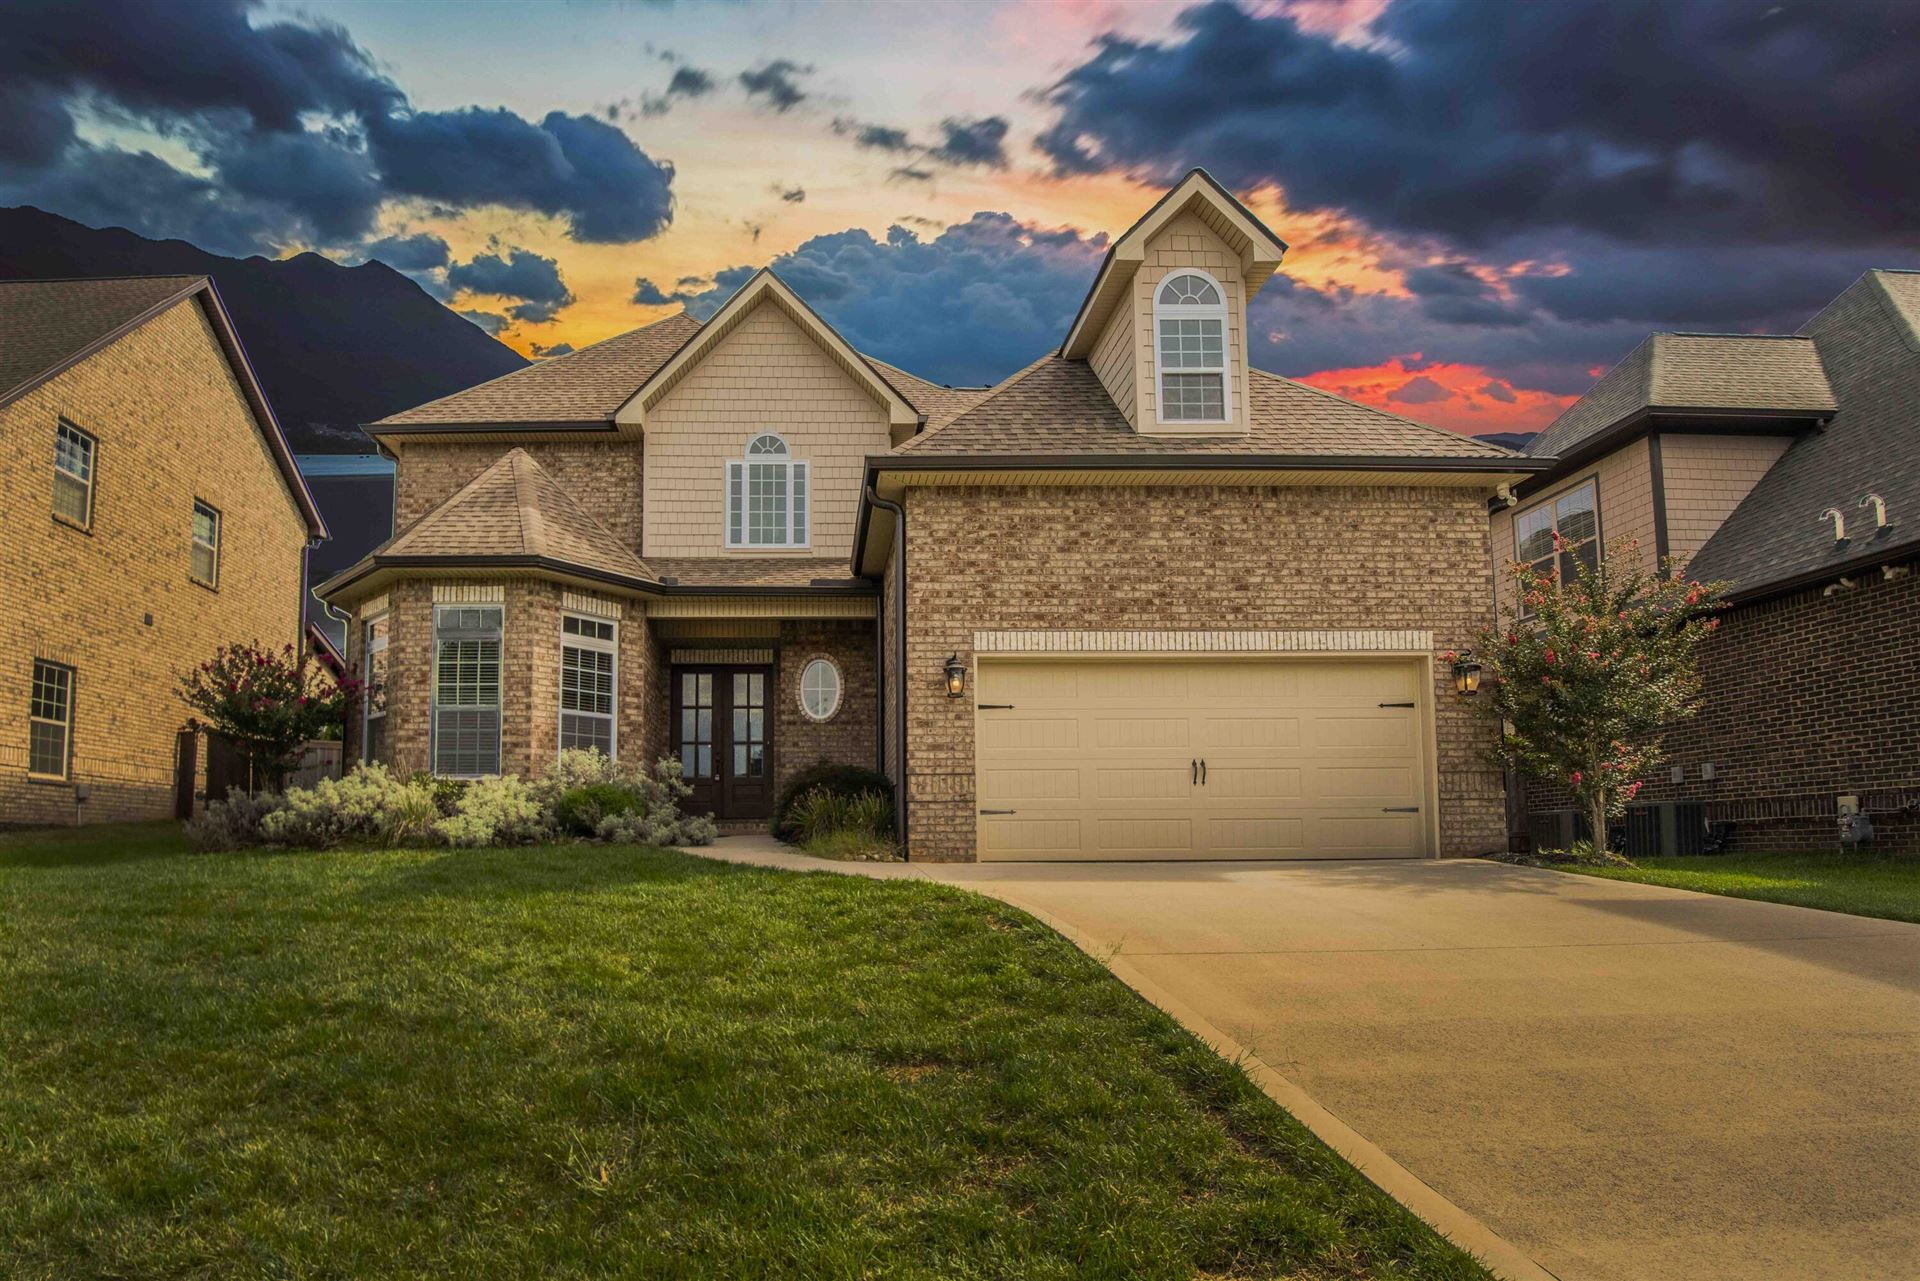 Photo of 1406 Penrose Terrace Lane, Knoxville, TN 37923 (MLS # 1167742)